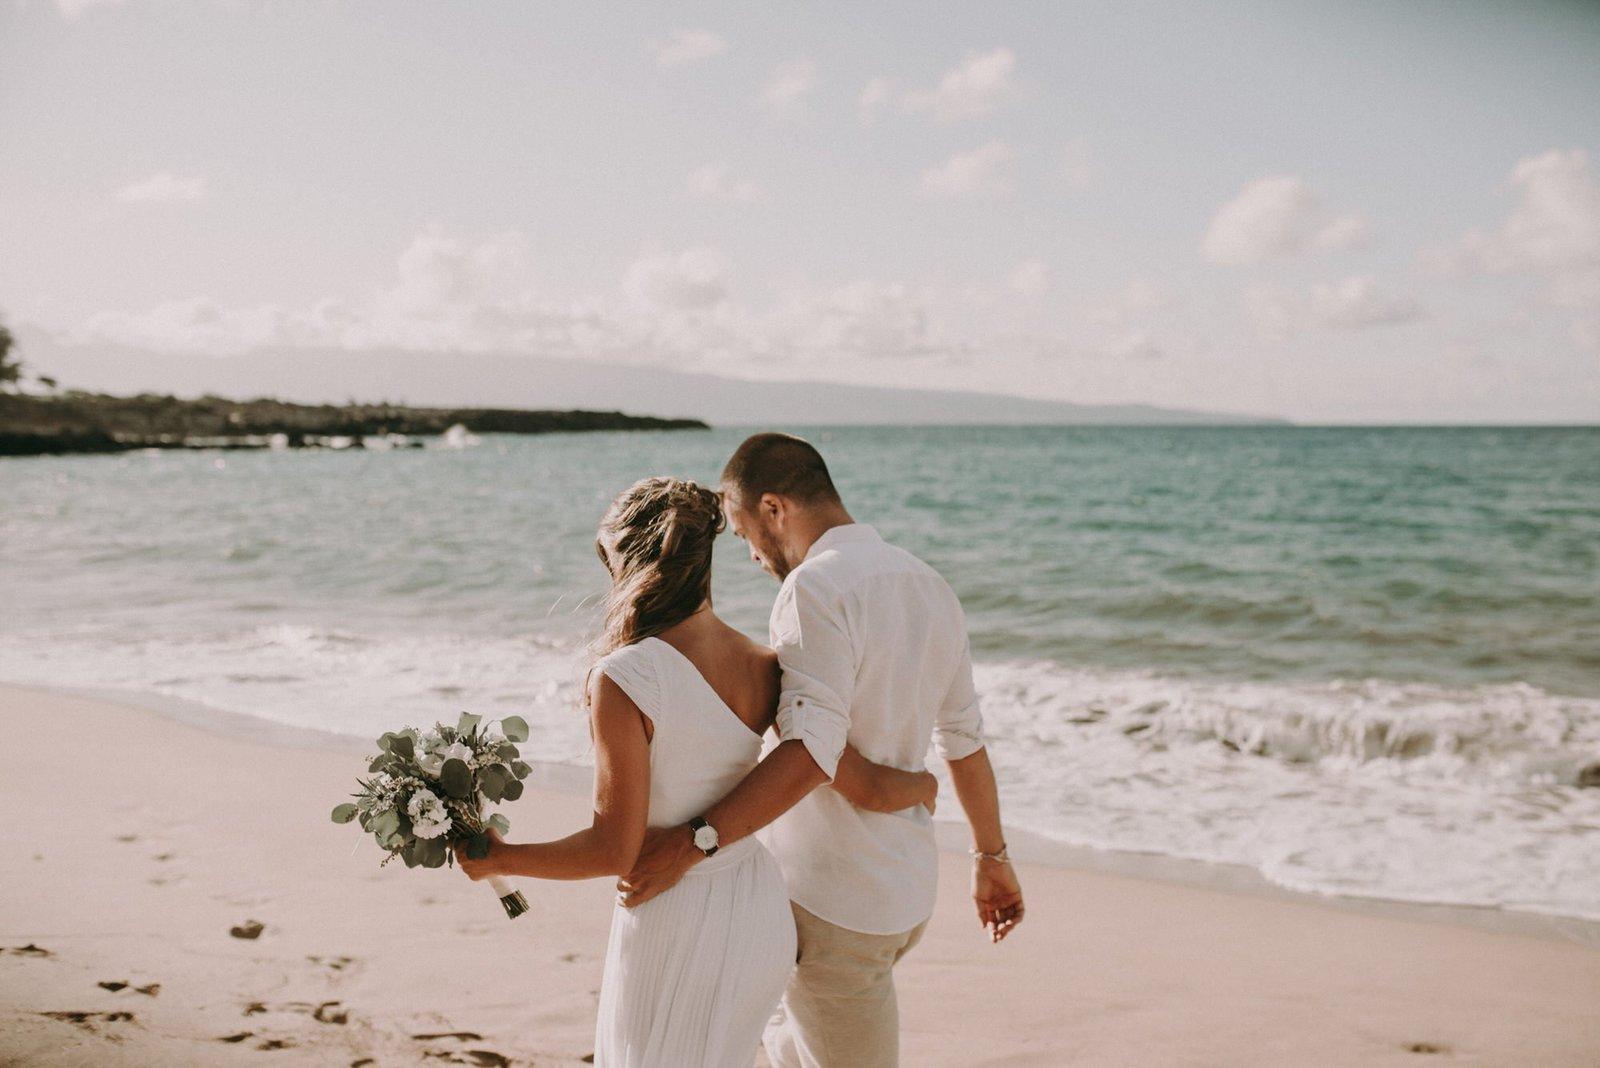 bride and groom walk in beach in Hawaii